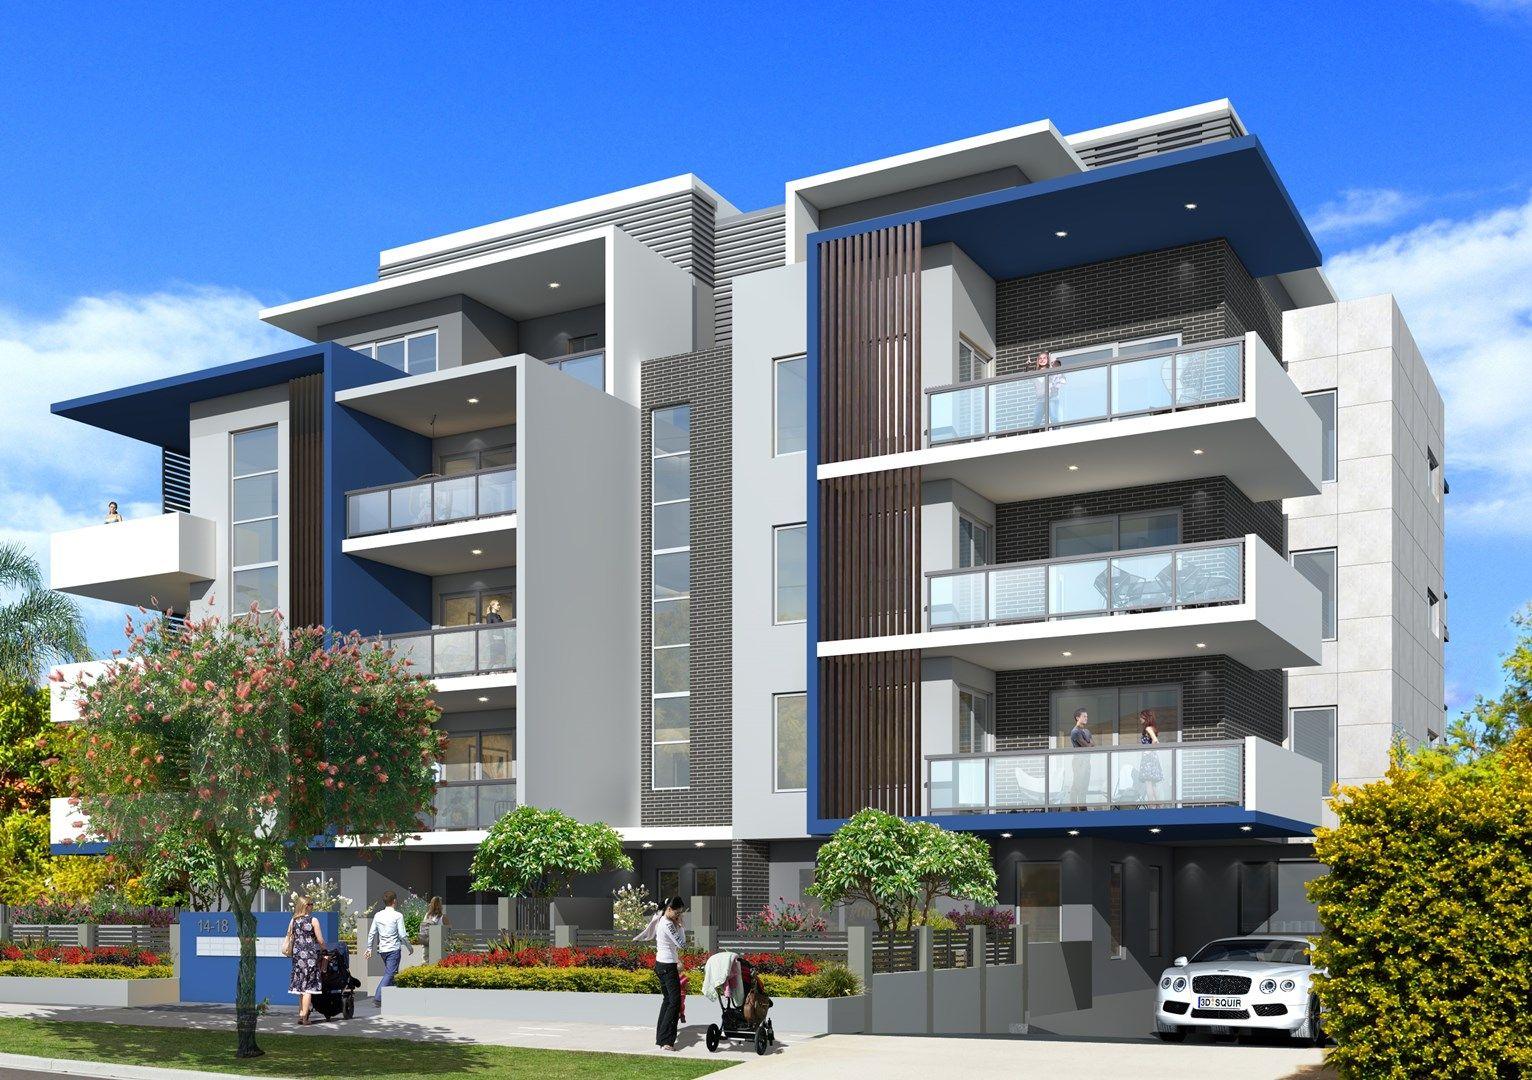 15/14-18 Bellevue Street, Thornleigh NSW 2120, Image 1